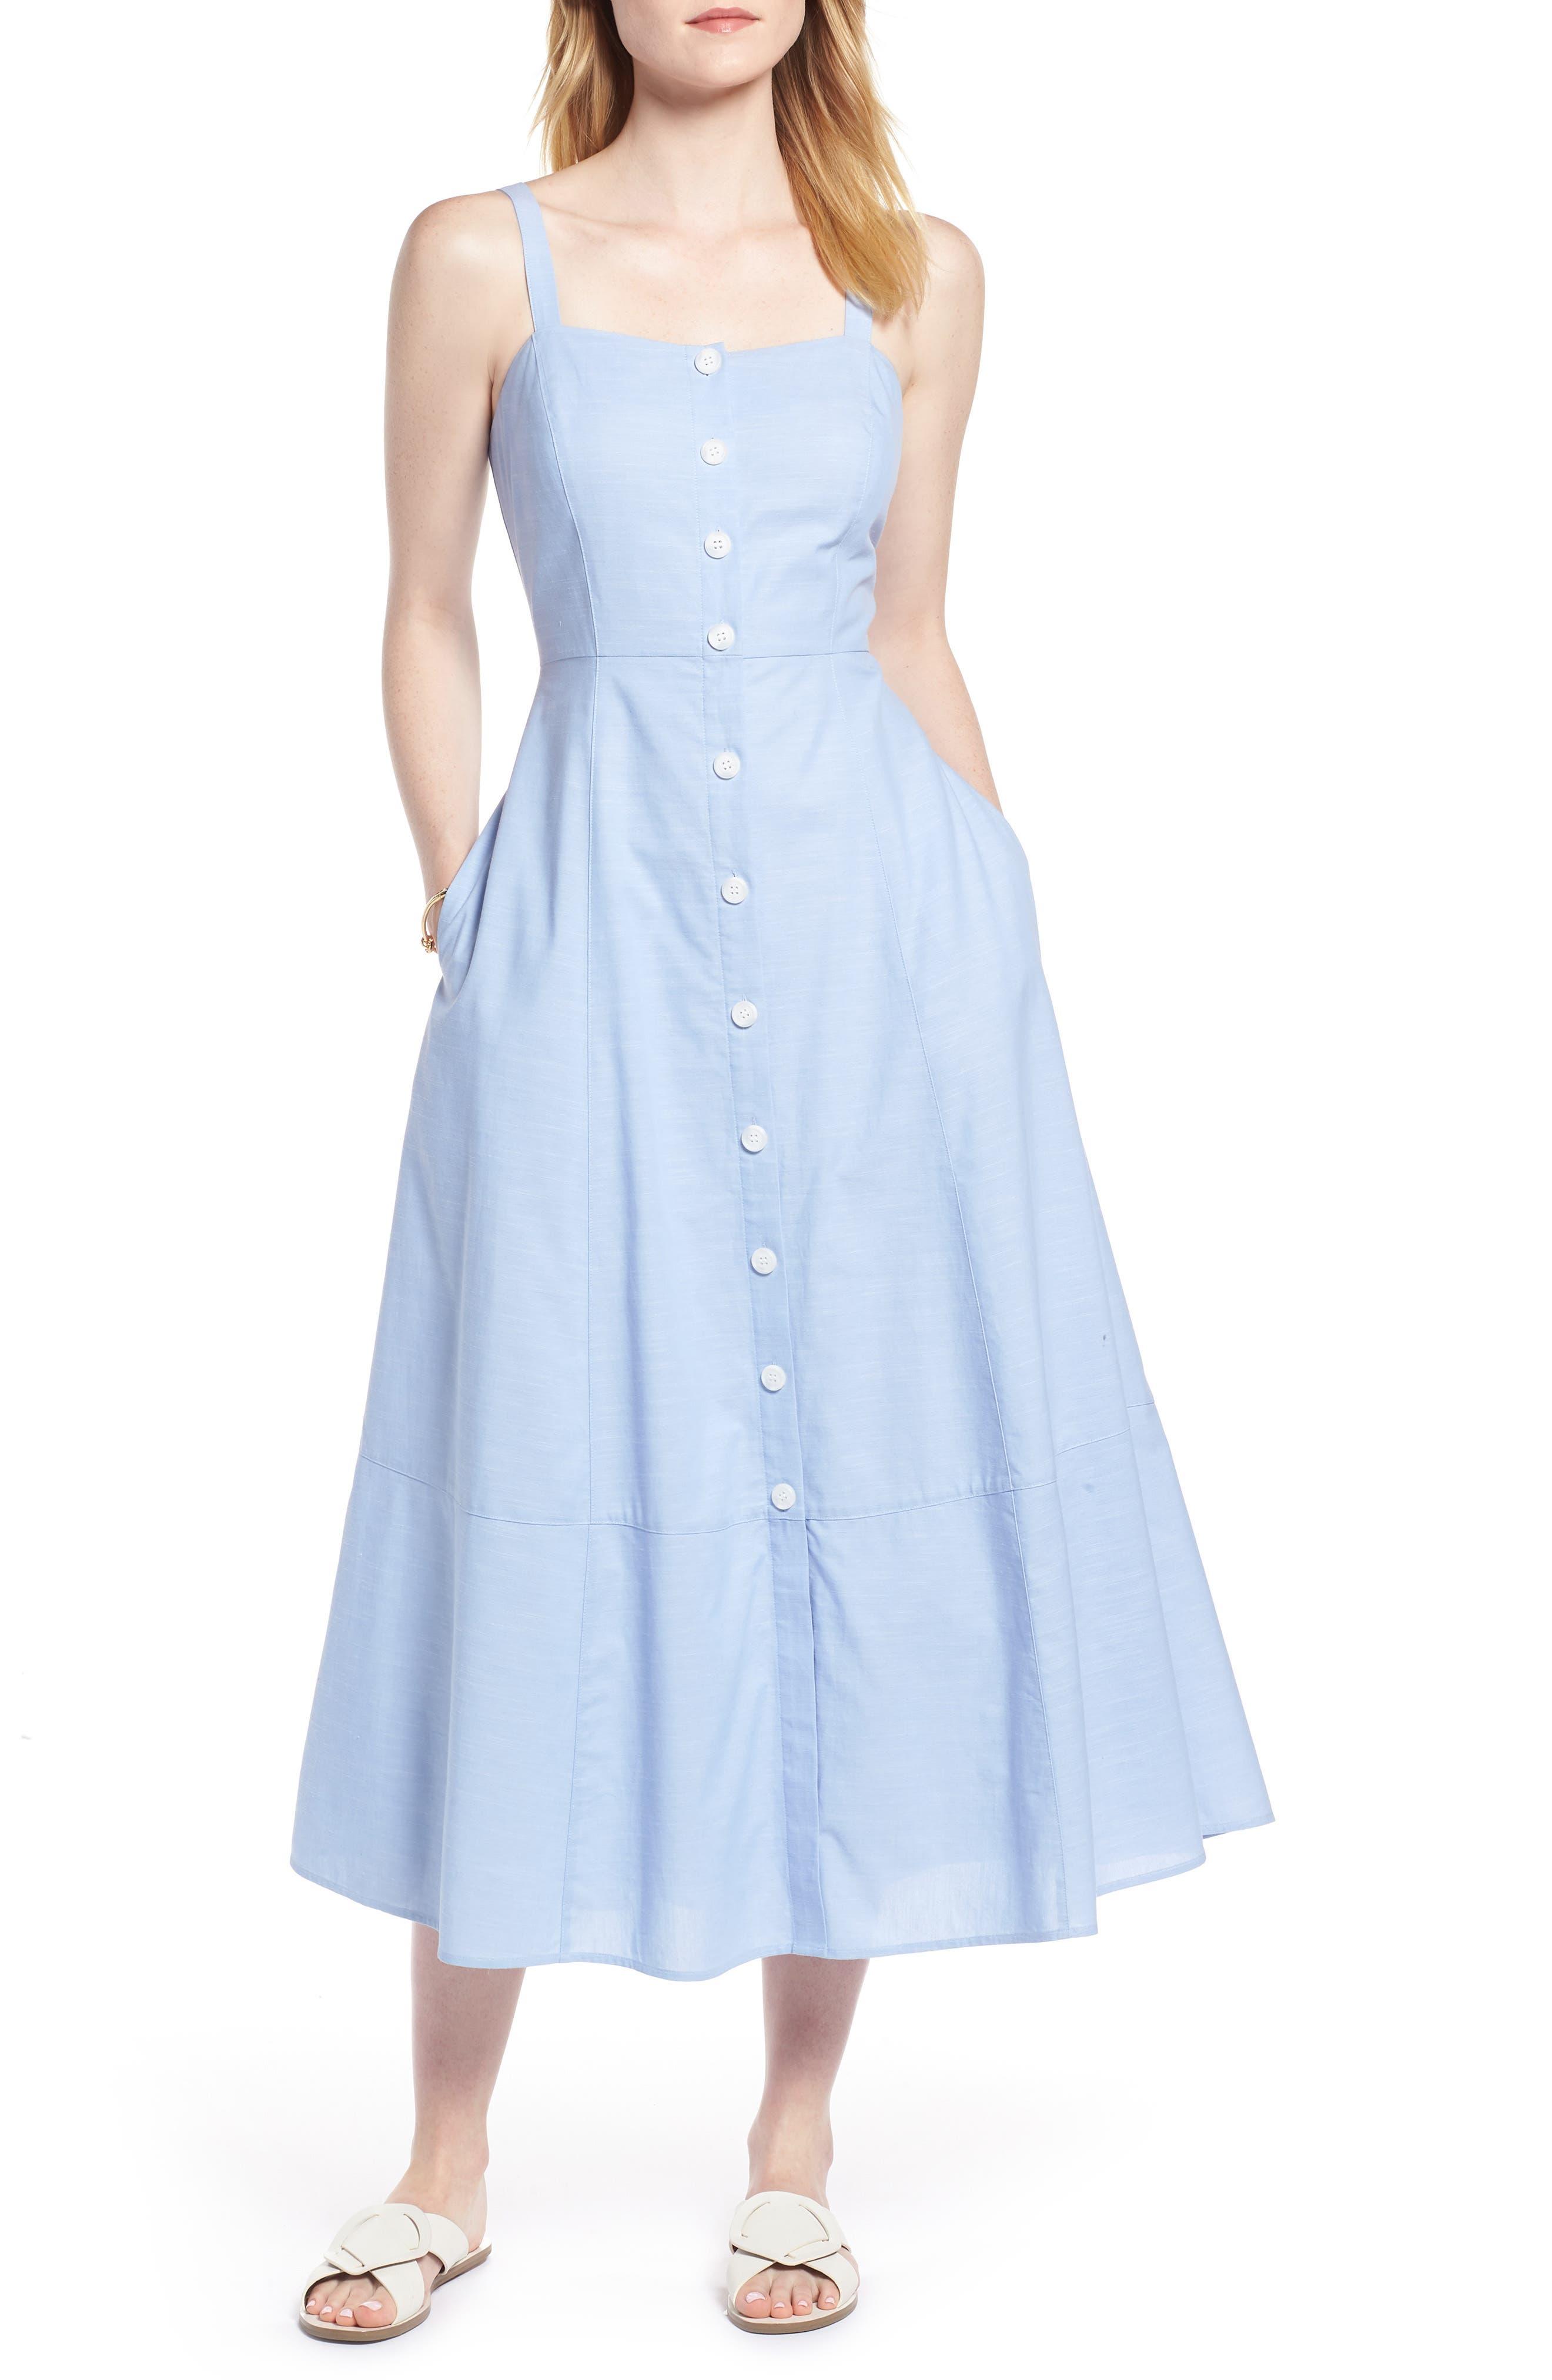 Button Front Chambray Cotton Dress,                             Main thumbnail 1, color,                             Chambray